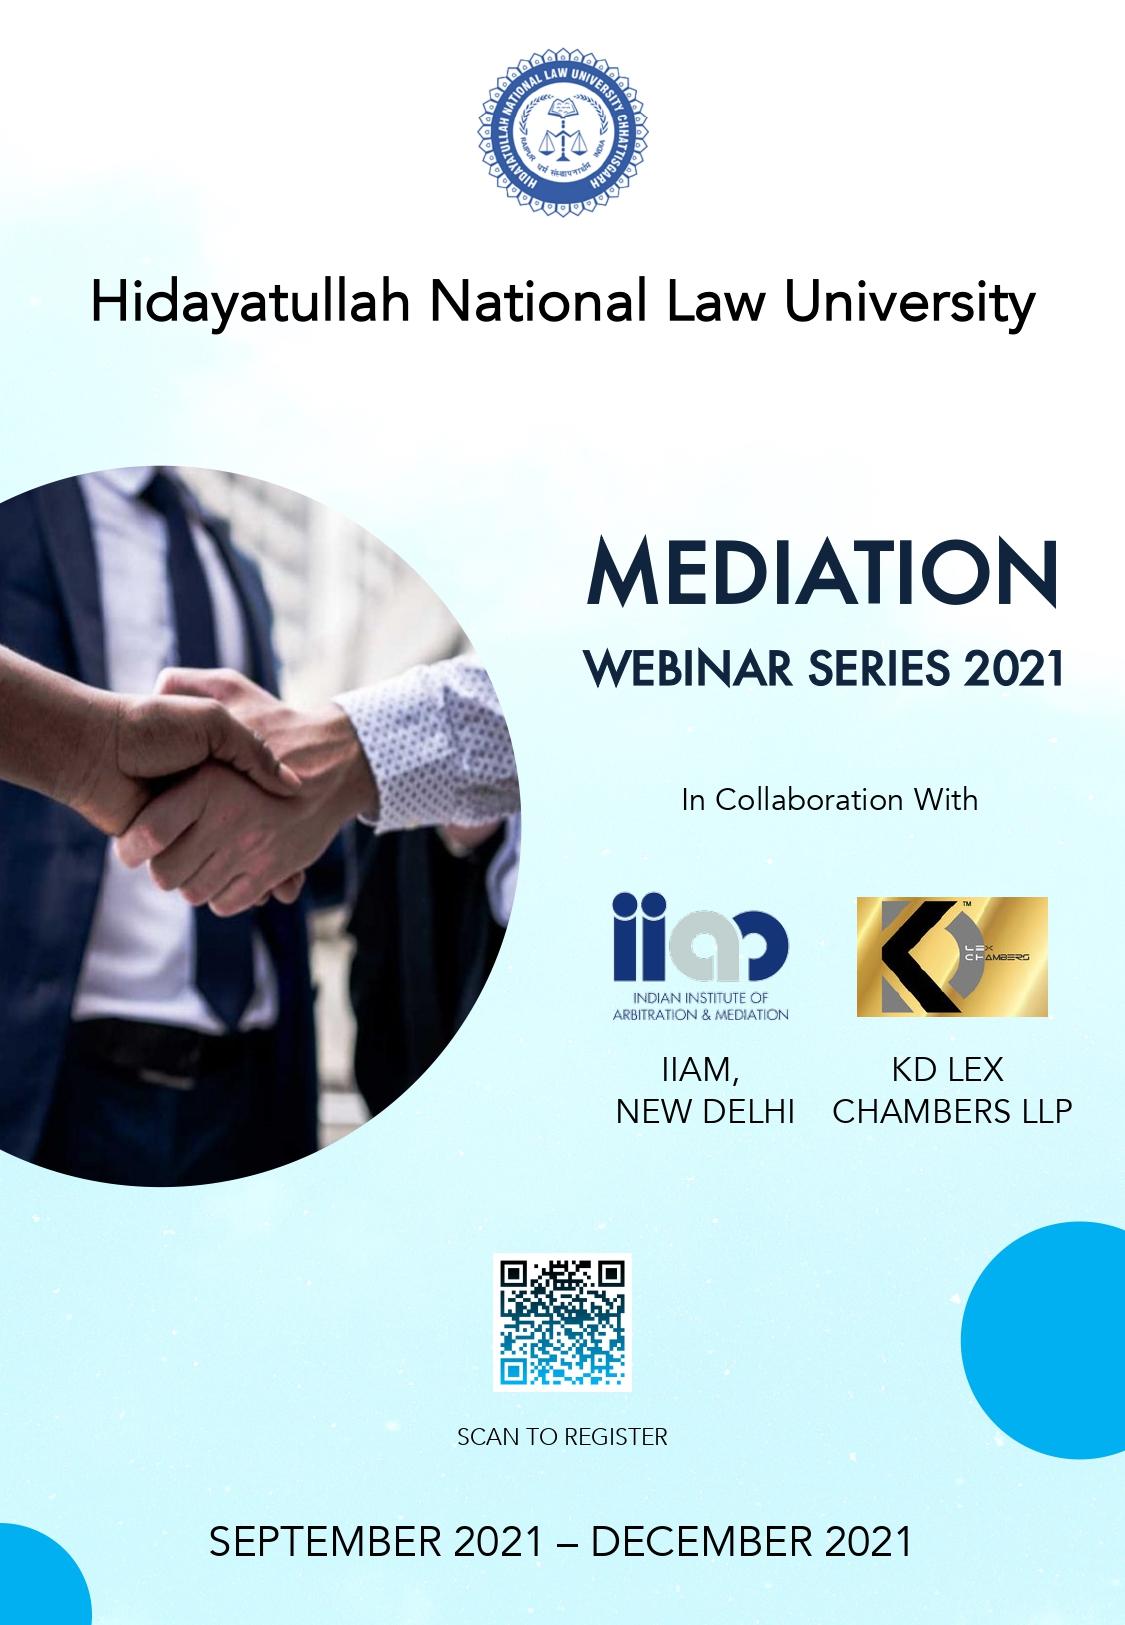 Mediation Webinar Series – HNLU, IIAM & KD Lex Chambers